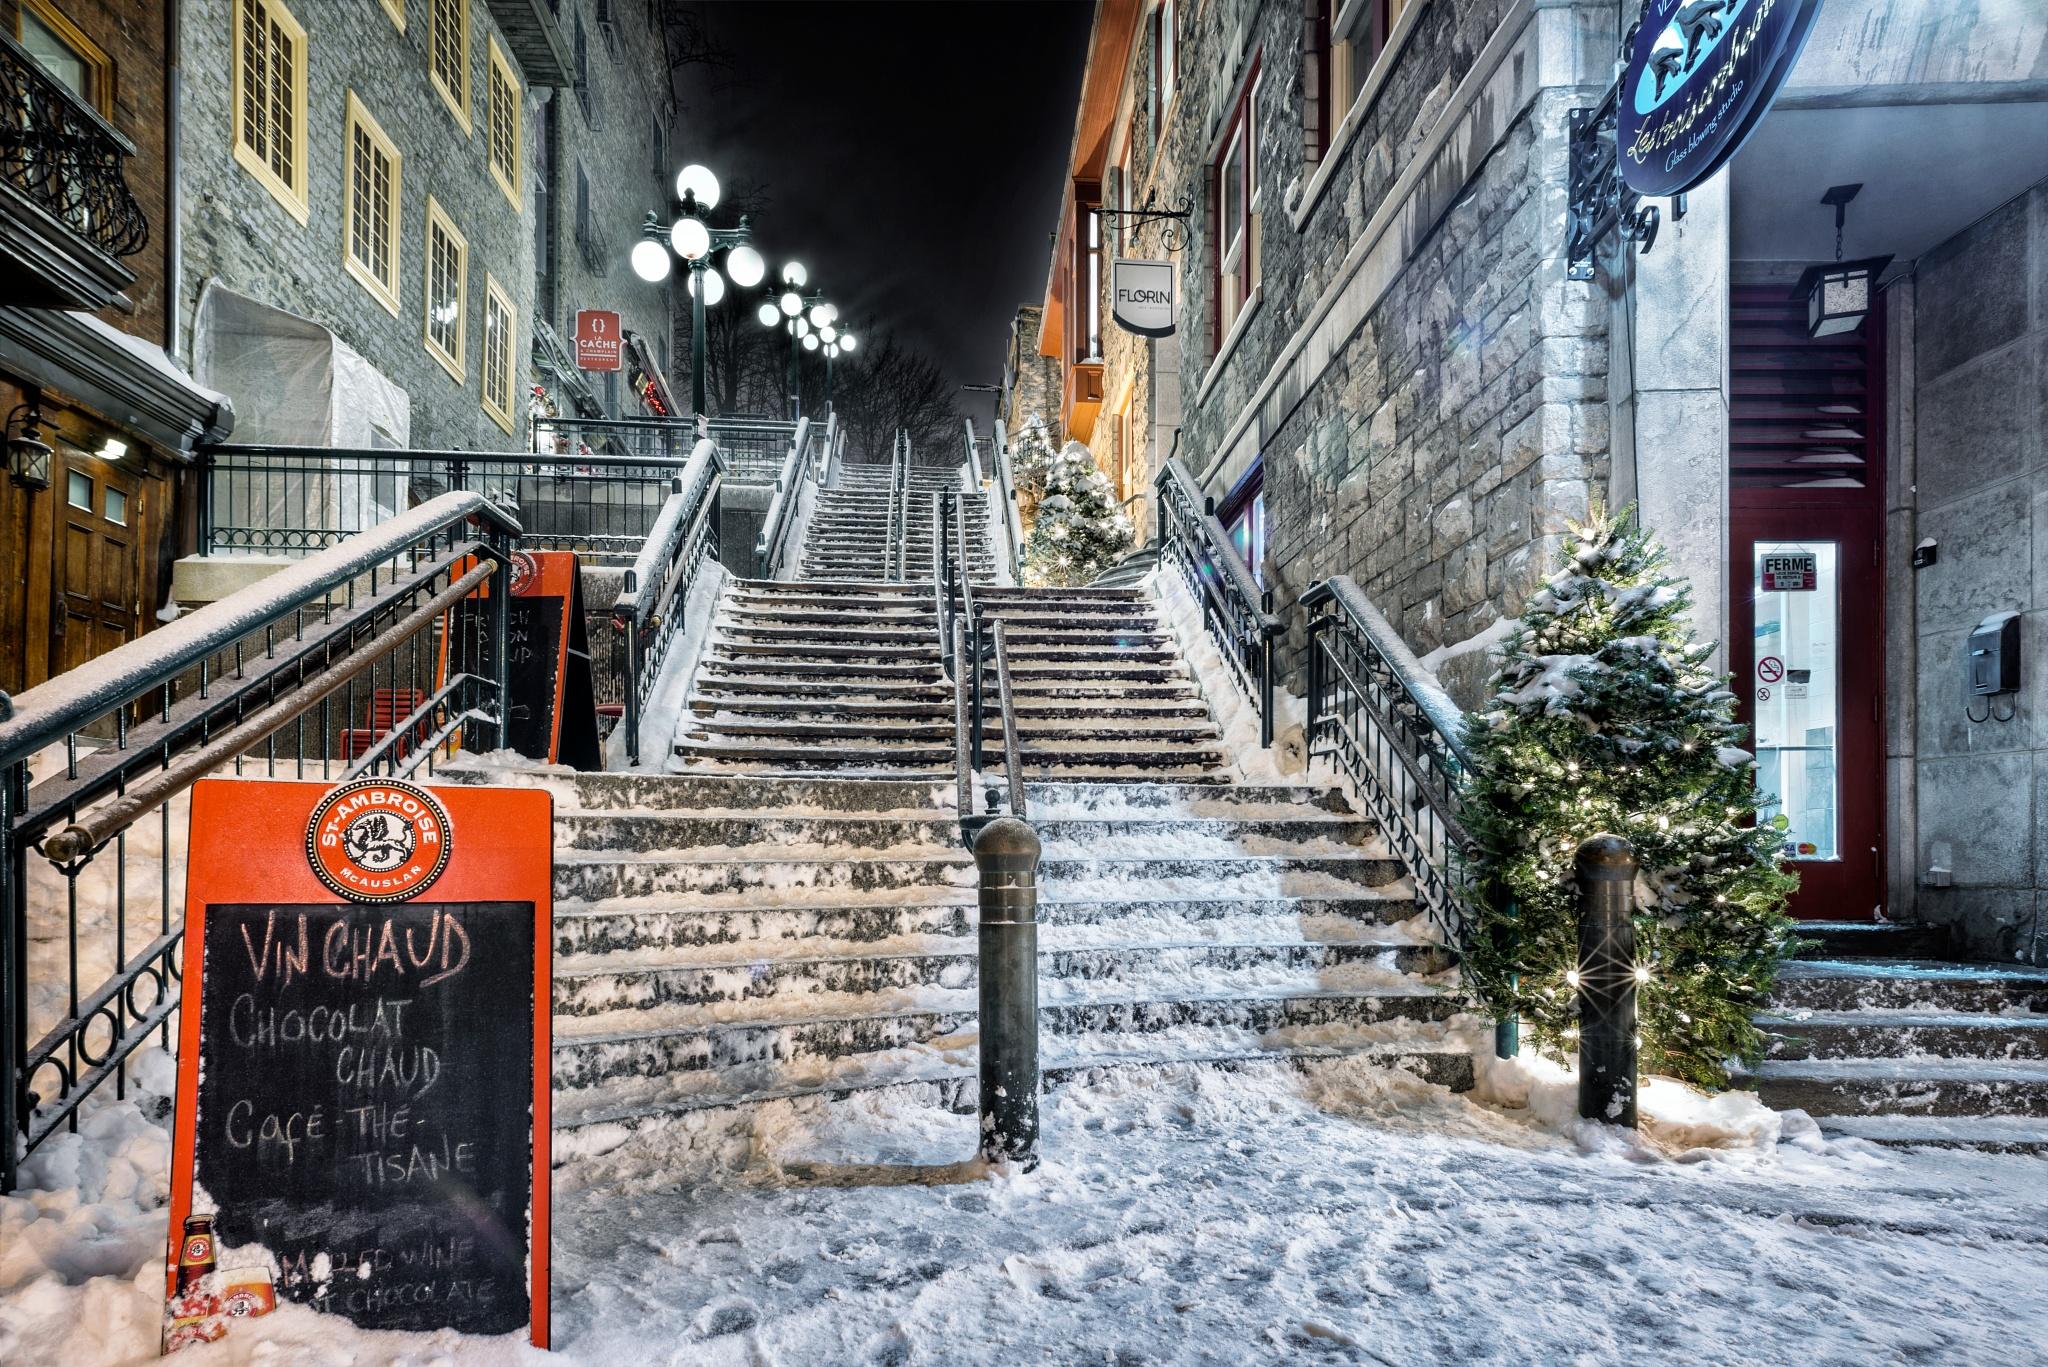 Old Quebec, Escalier Casse-cou by Clermont Poliquin